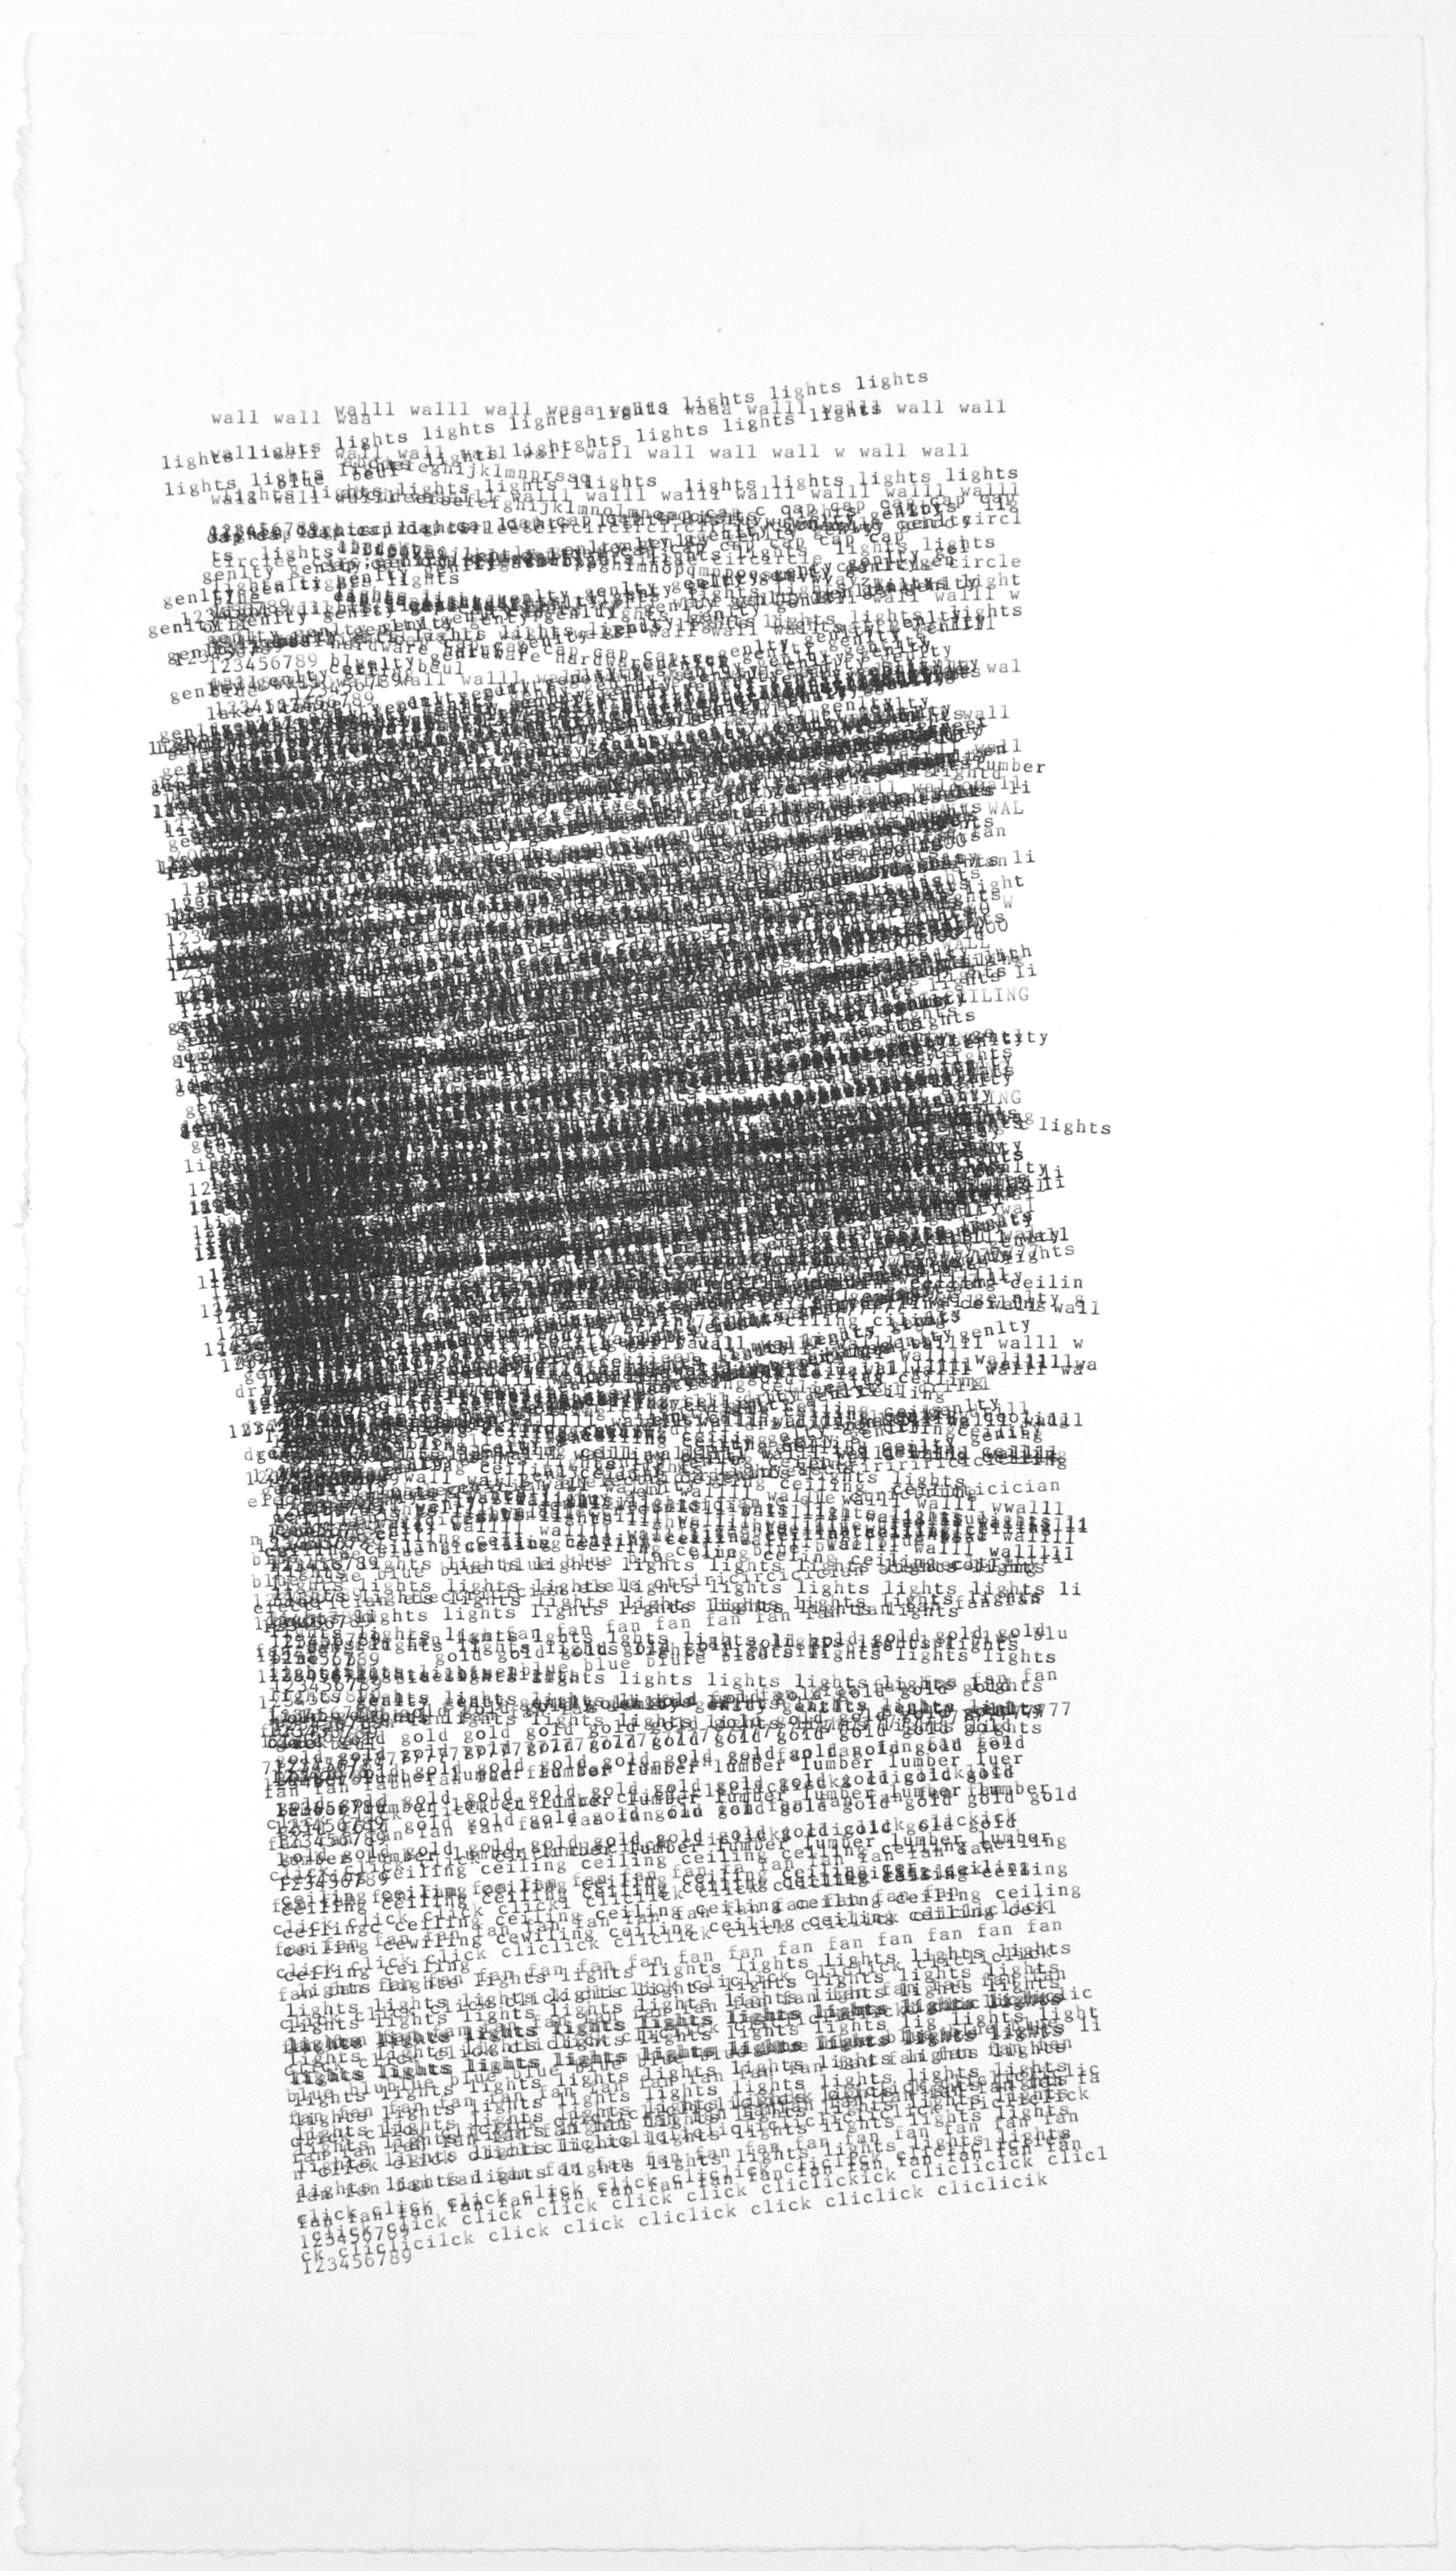 Dan Miller, Untitled (DM 987), 2018, 10 x 20.125 inches